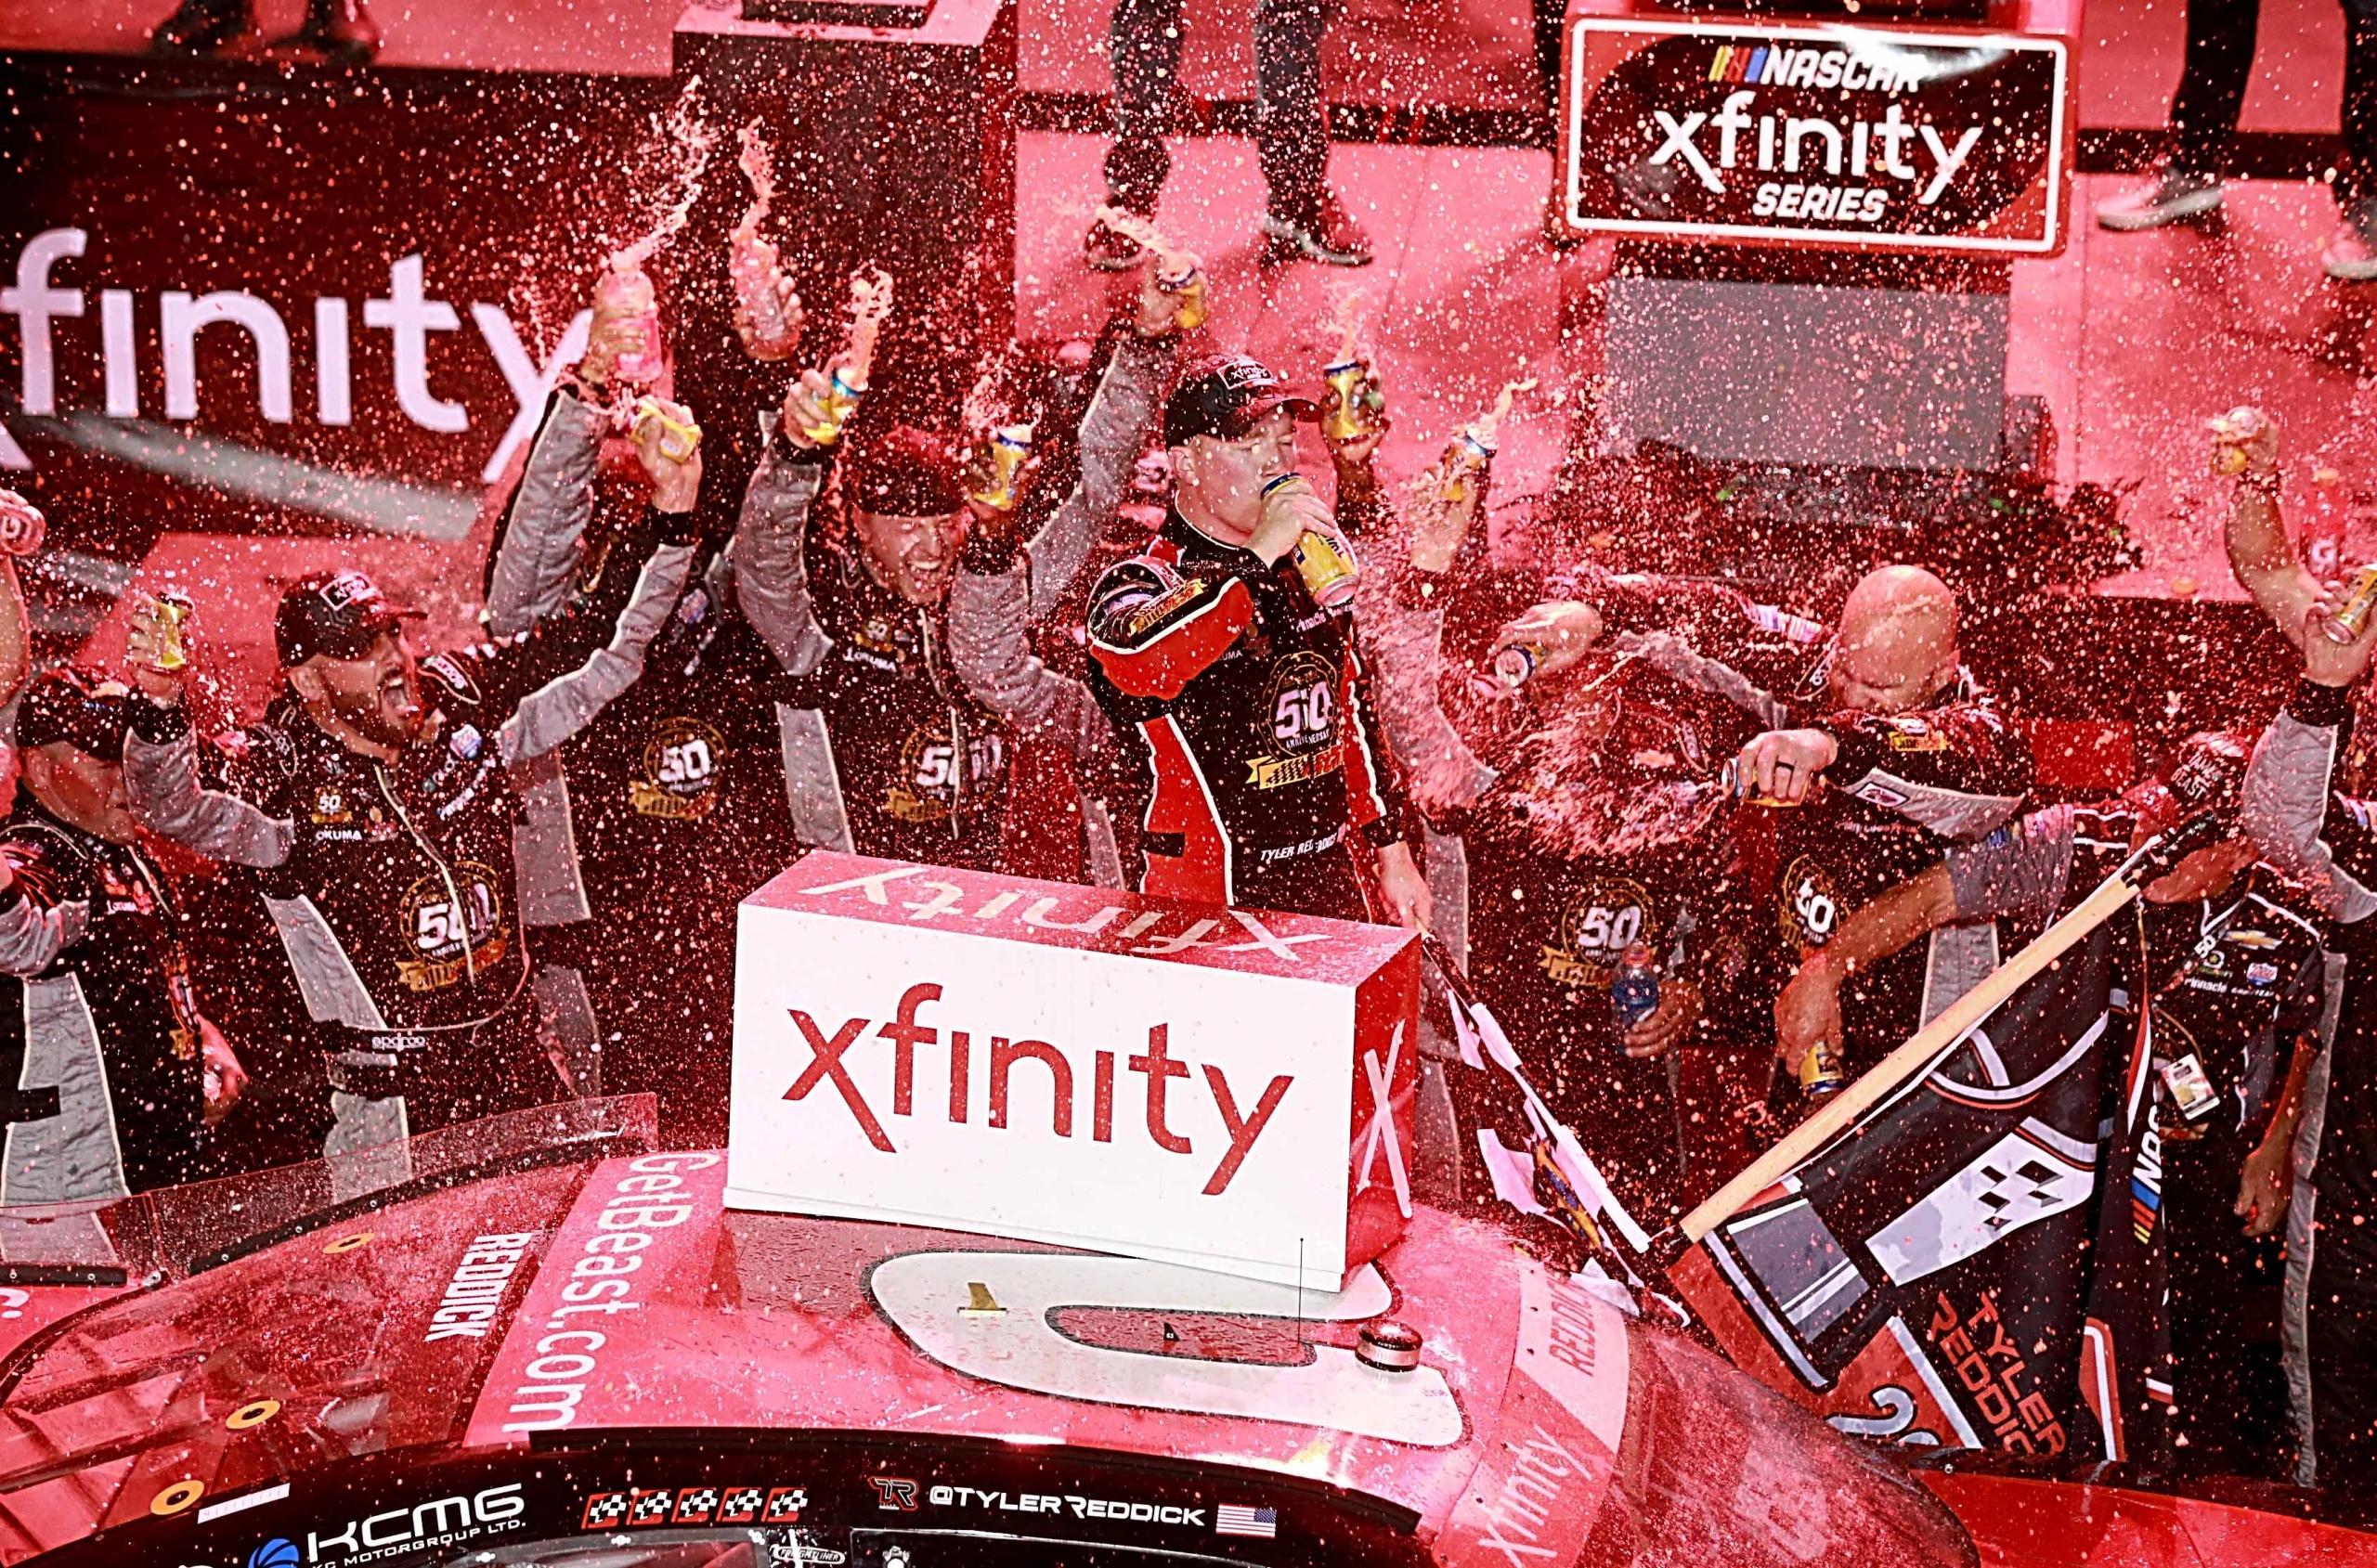 Tyler Reddick - 2019 NASCAR Xfinity Series champion